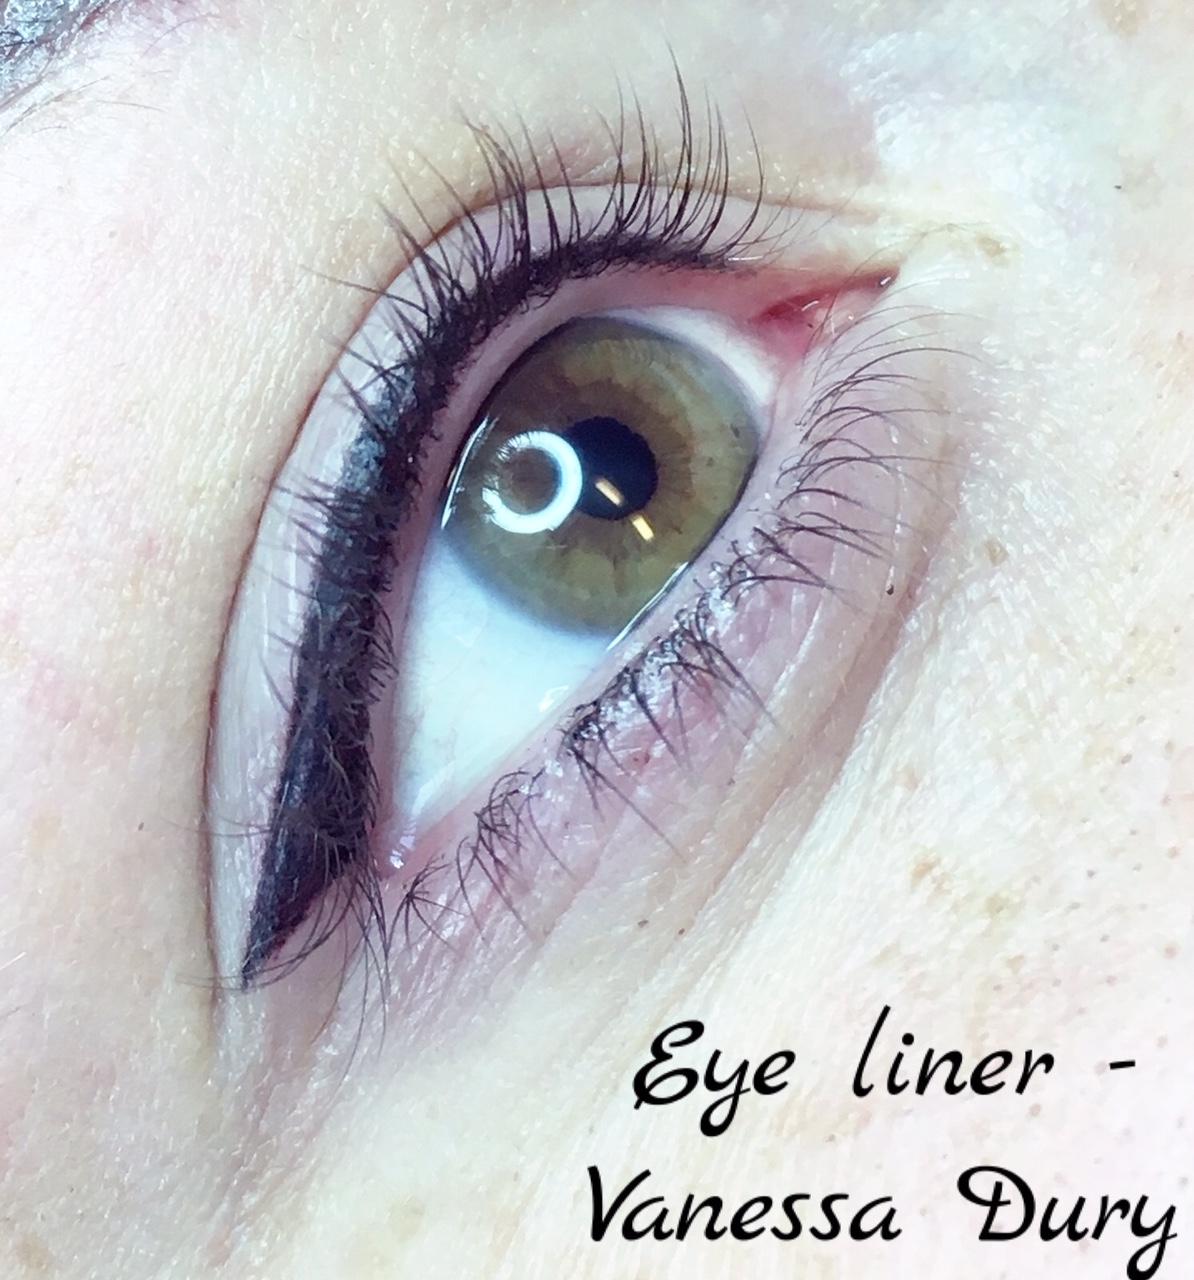 quadrilatera tattoo eye liner by vanessa